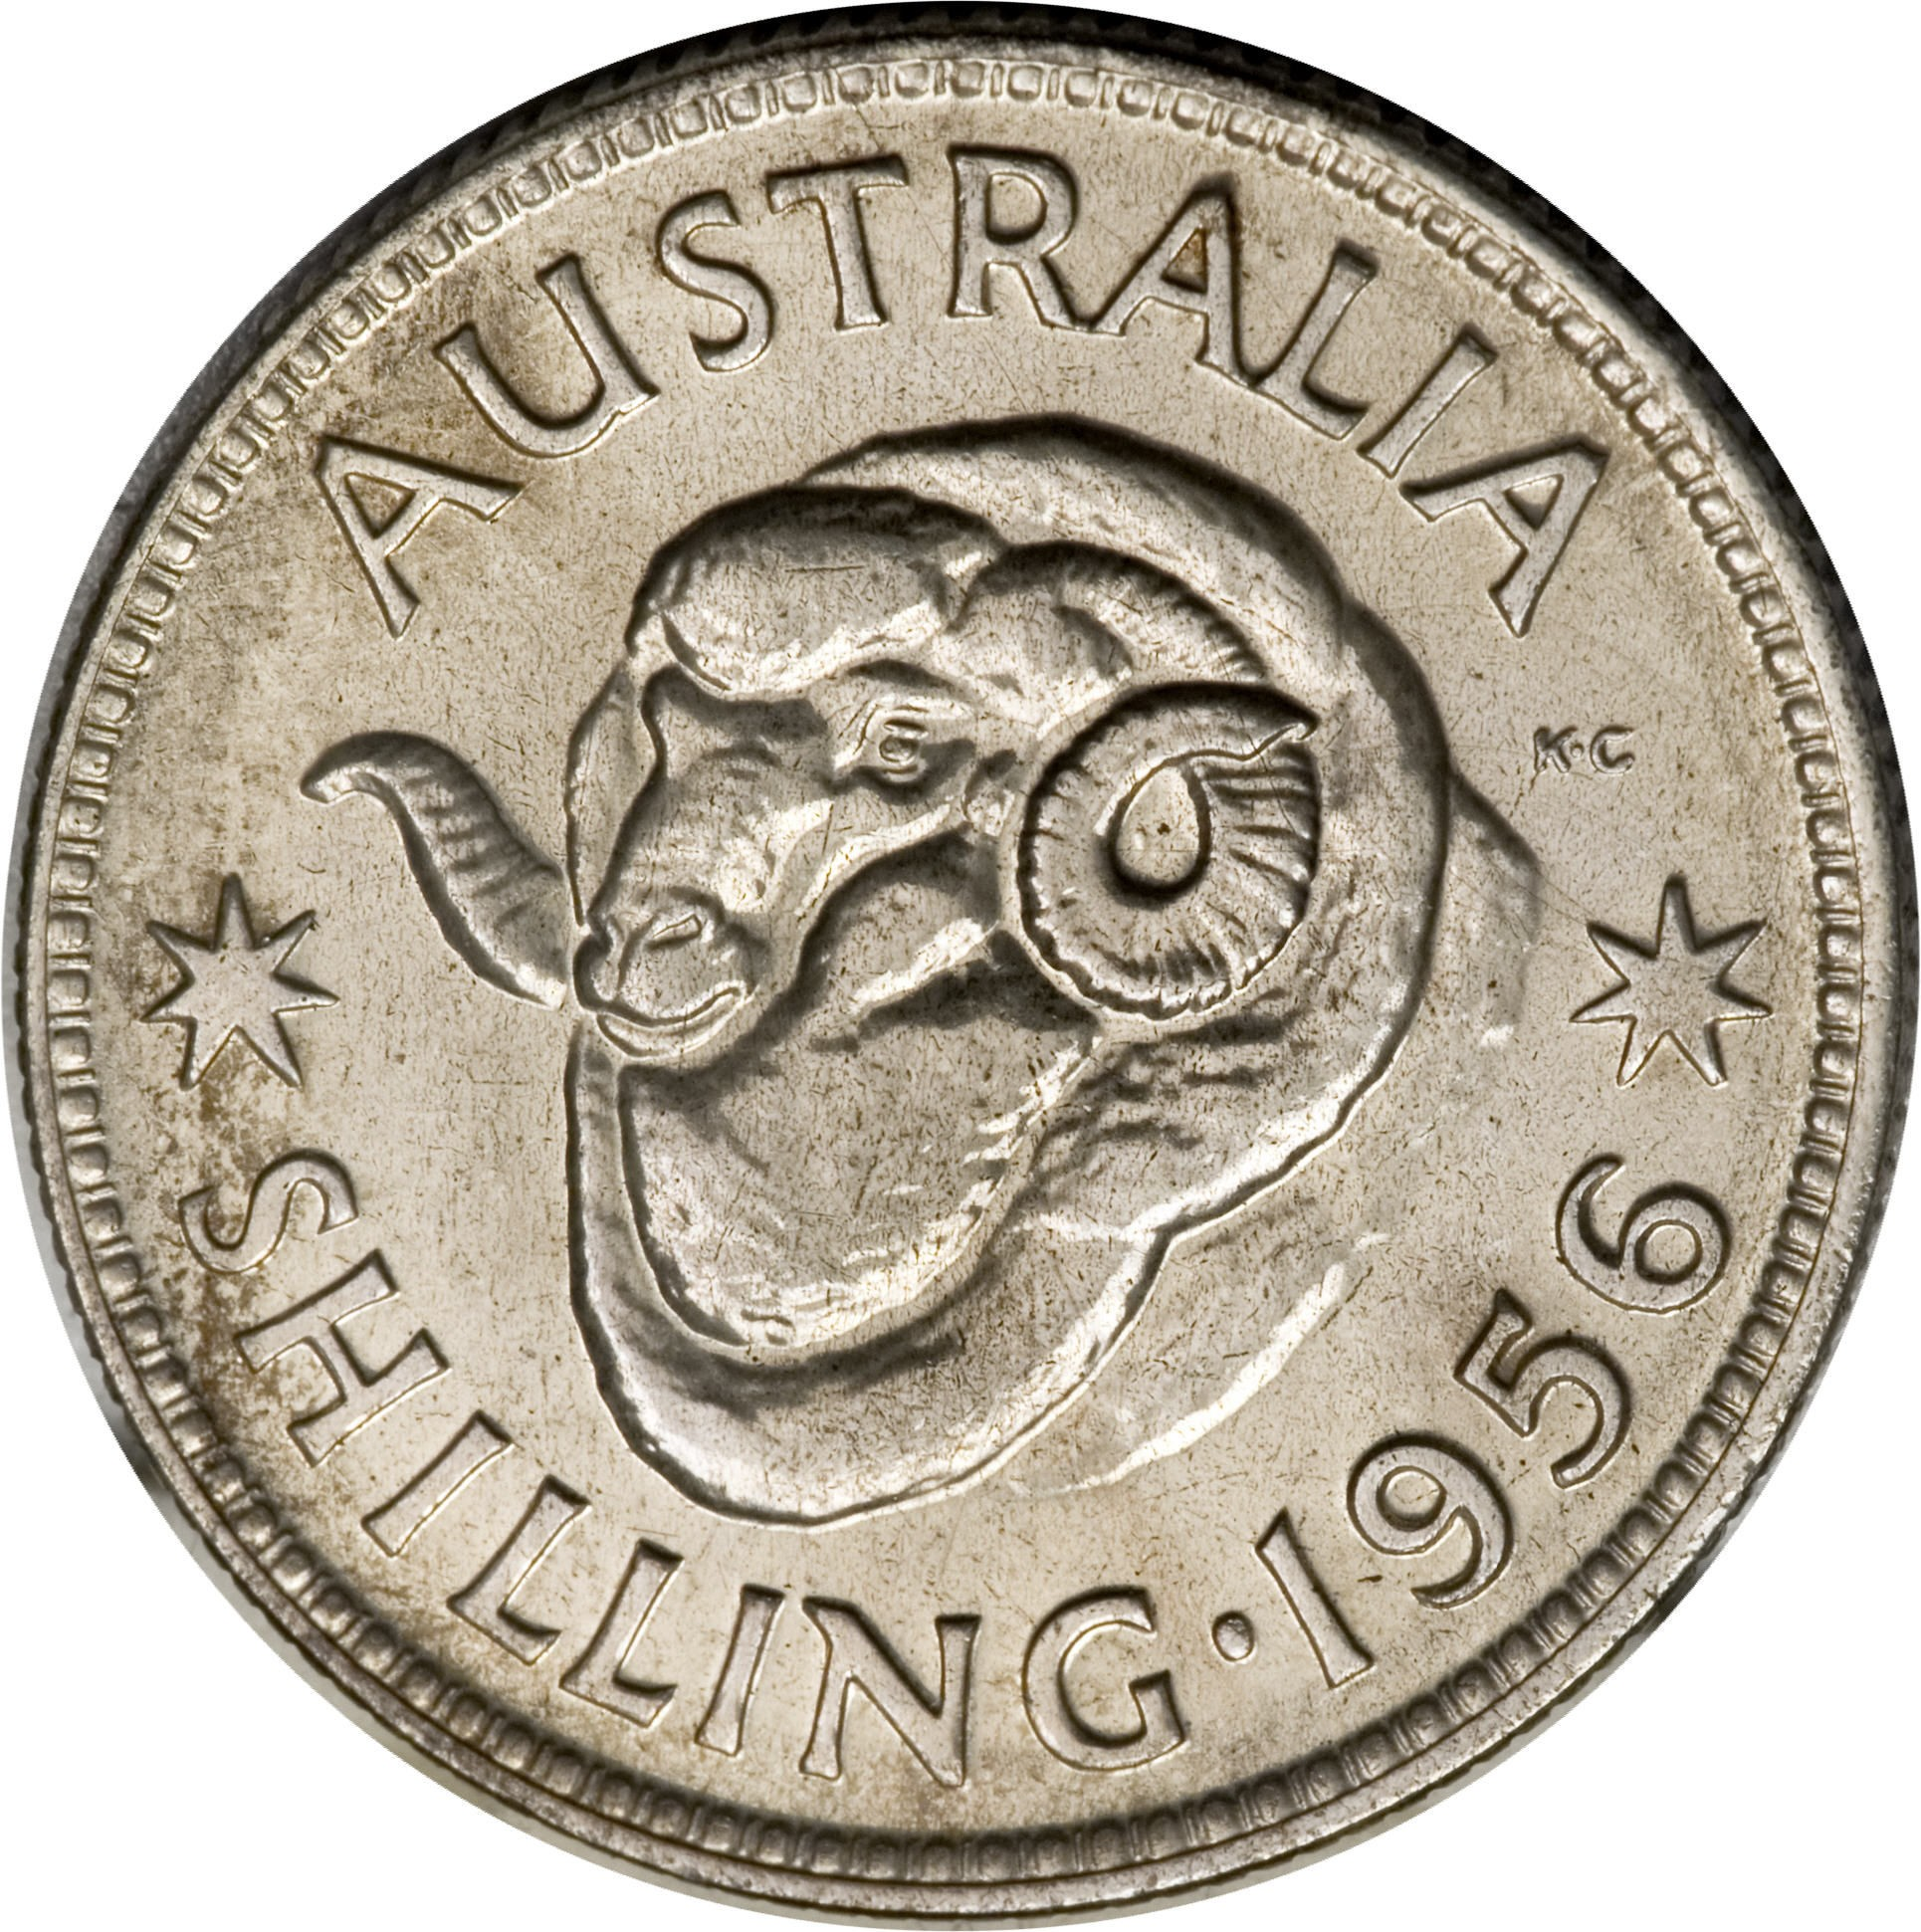 Australia 1 Shilling (1955-1963 Elizabeth II)